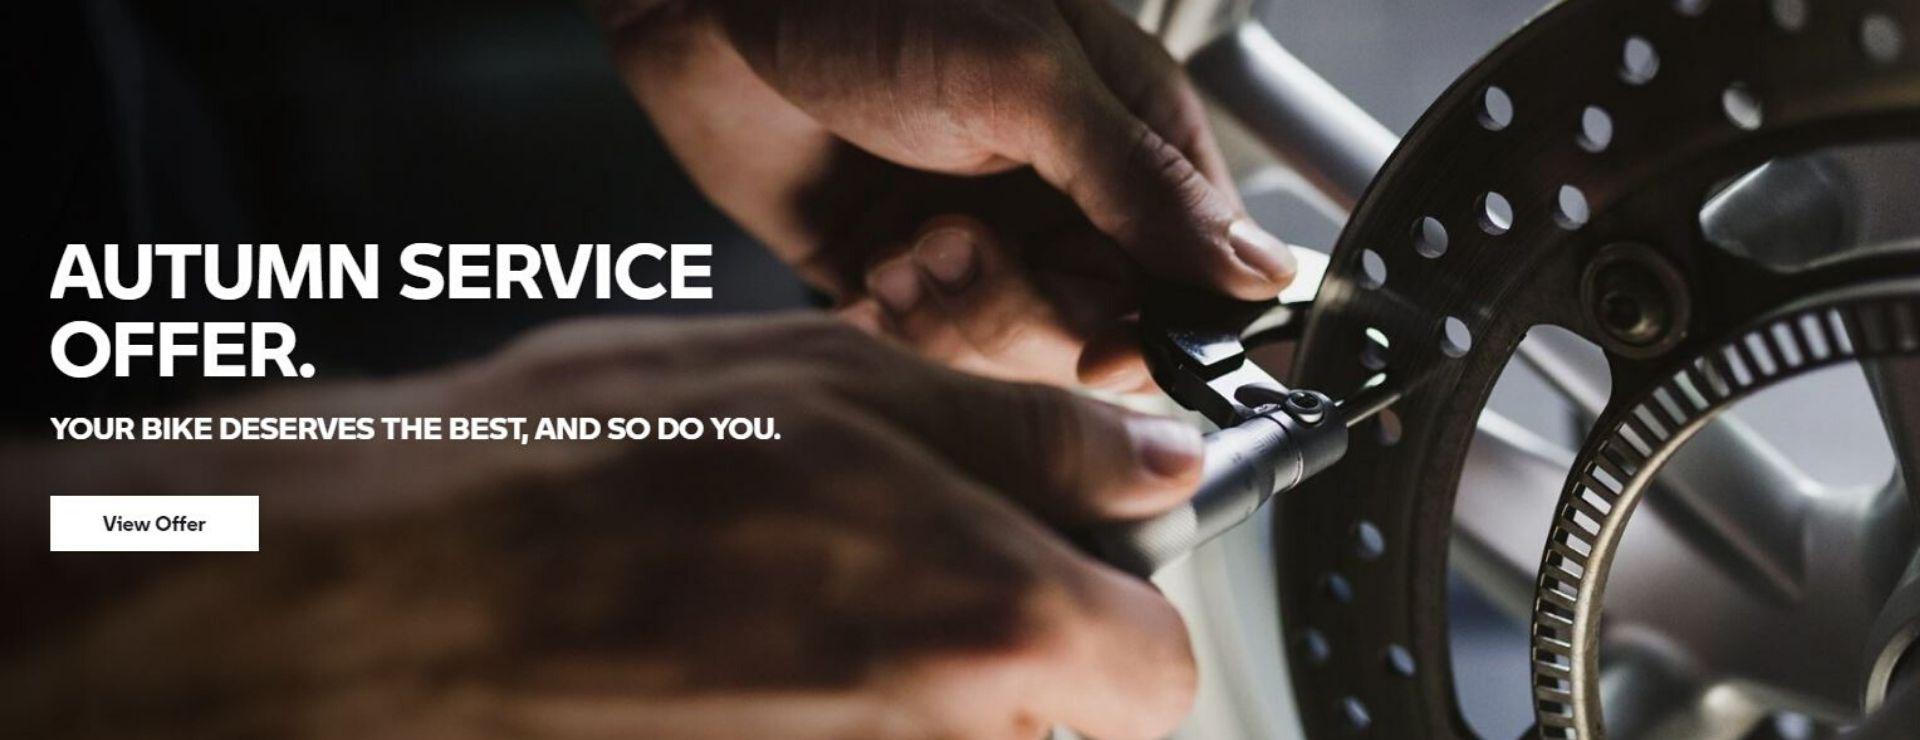 BMW Motorrad Service Offer